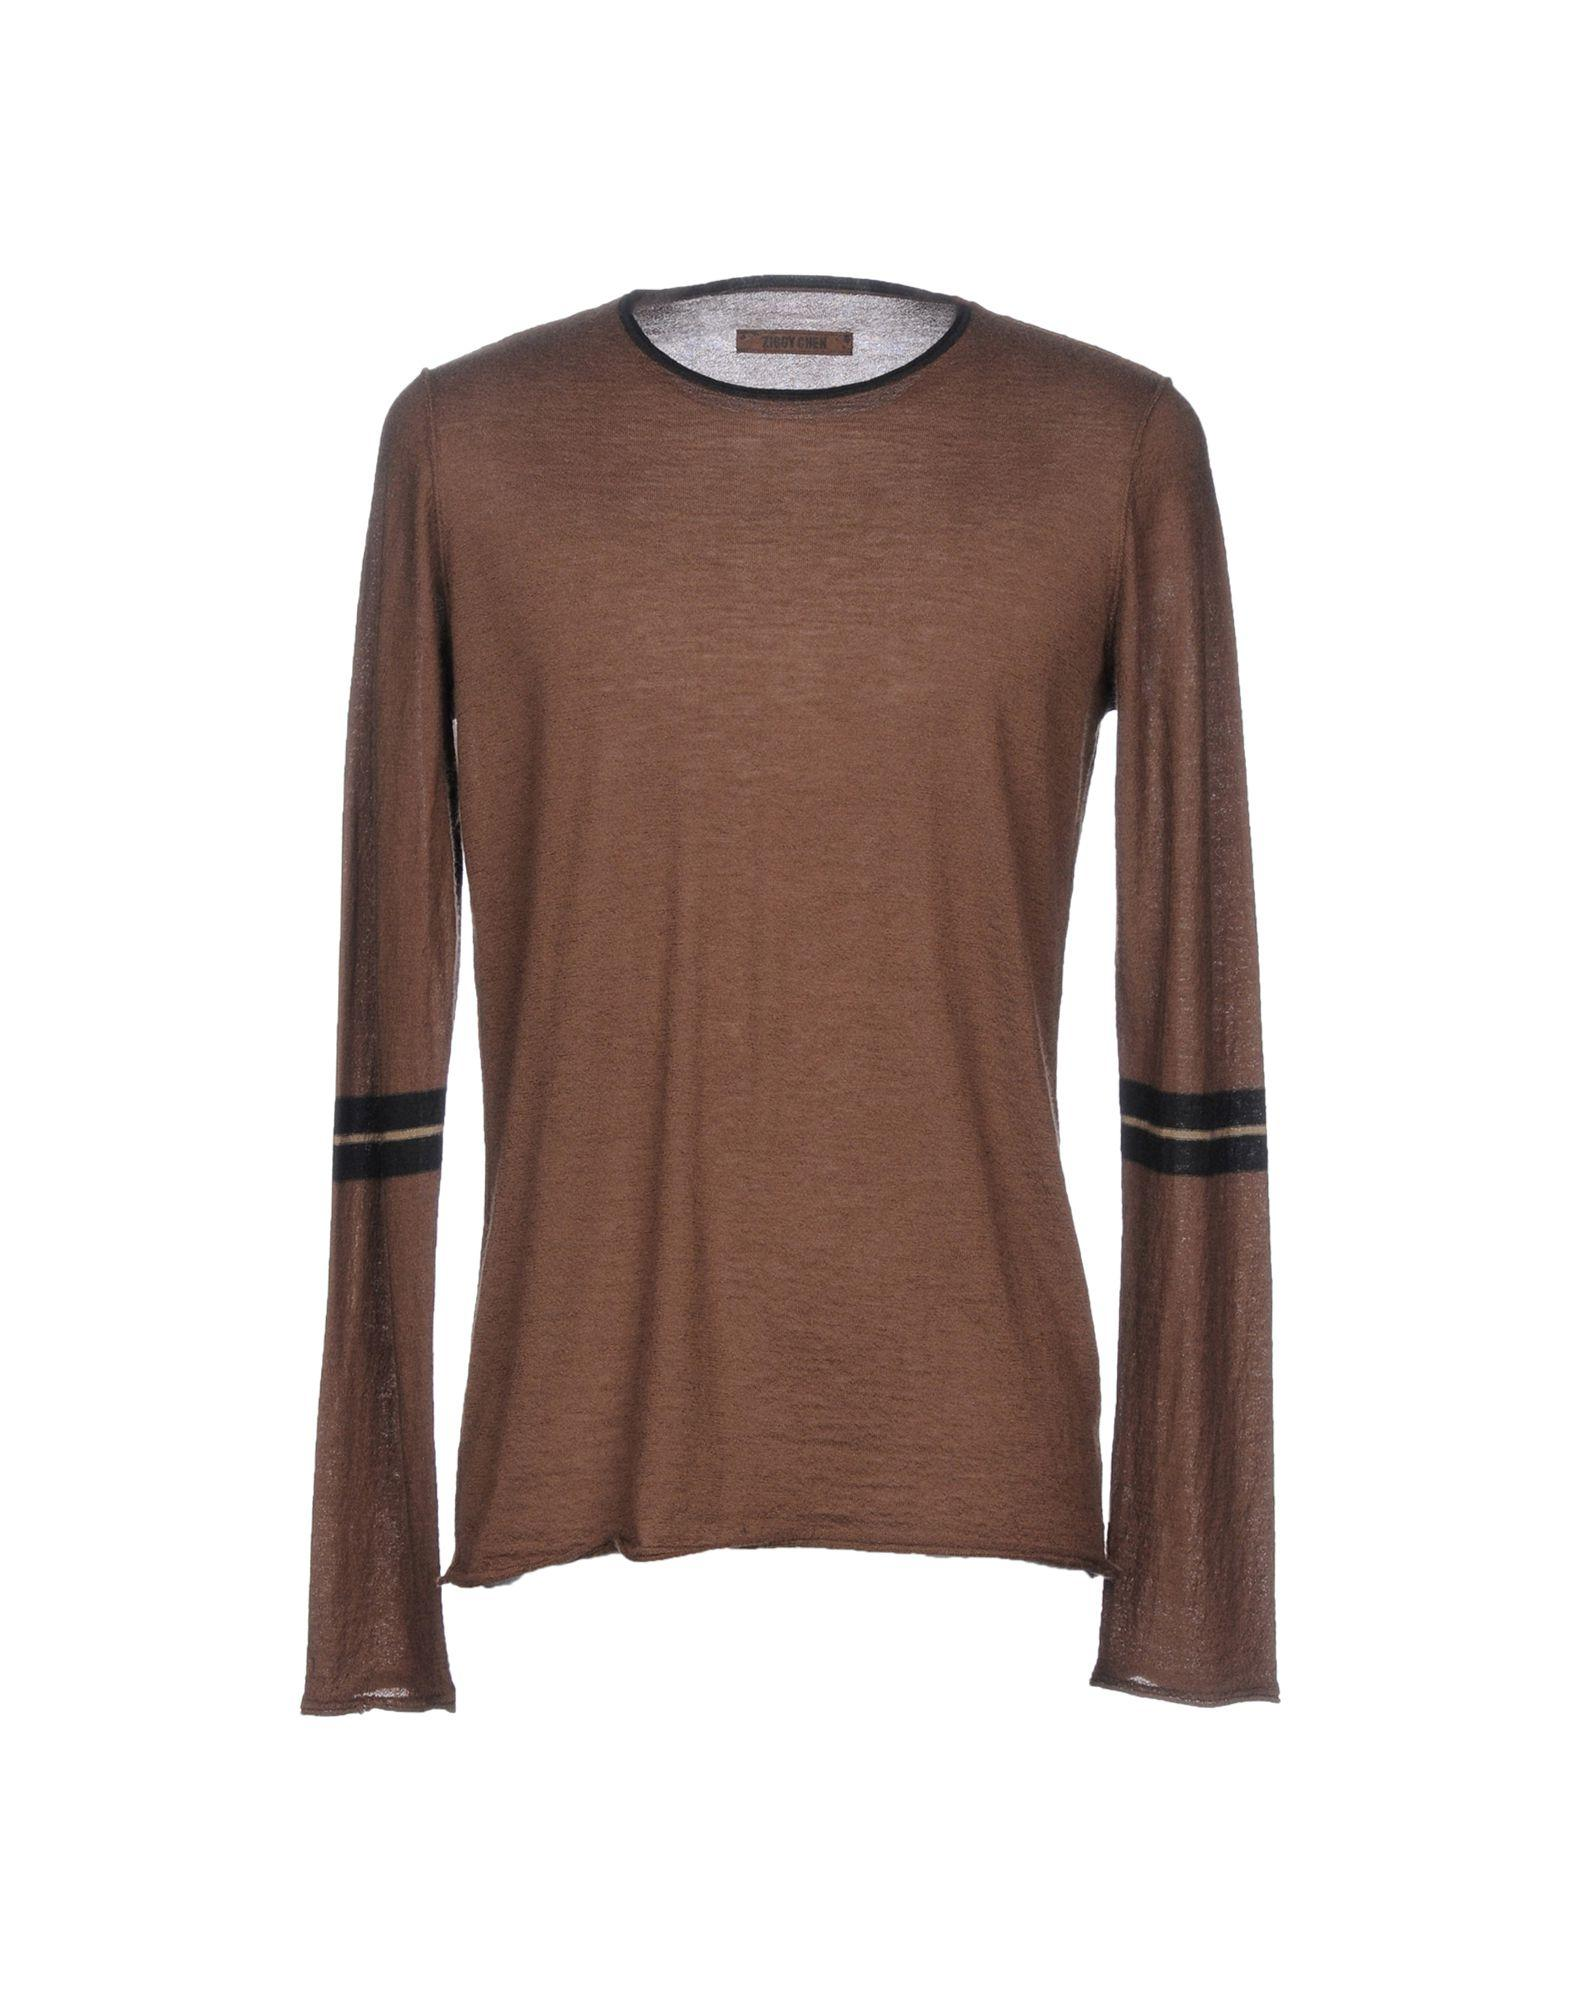 Ziggy Chen Sweaters In Khaki